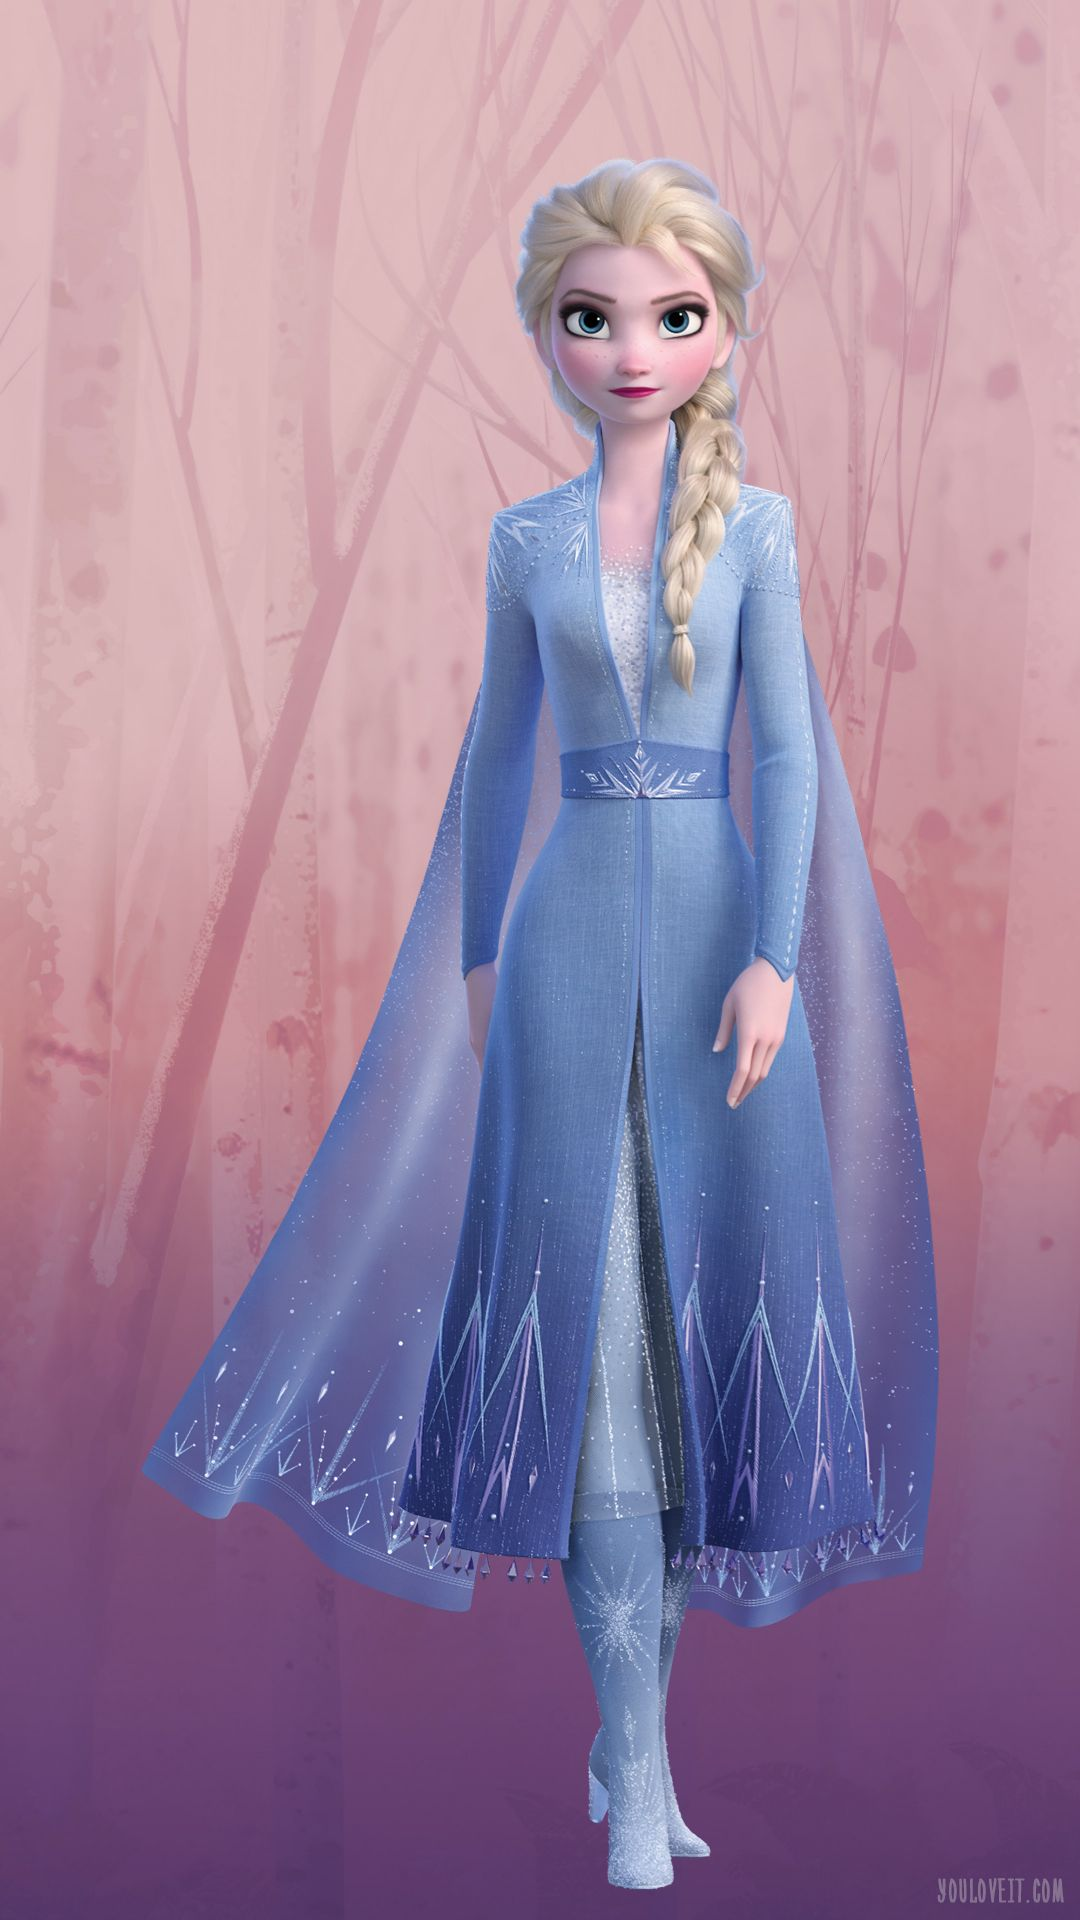 Frozen 2 Elsa Phone Wallpaper Frozen Photo 43115827 Fanpop In 2020 Disney Princess Elsa Disney Princess Frozen Frozen Disney Movie